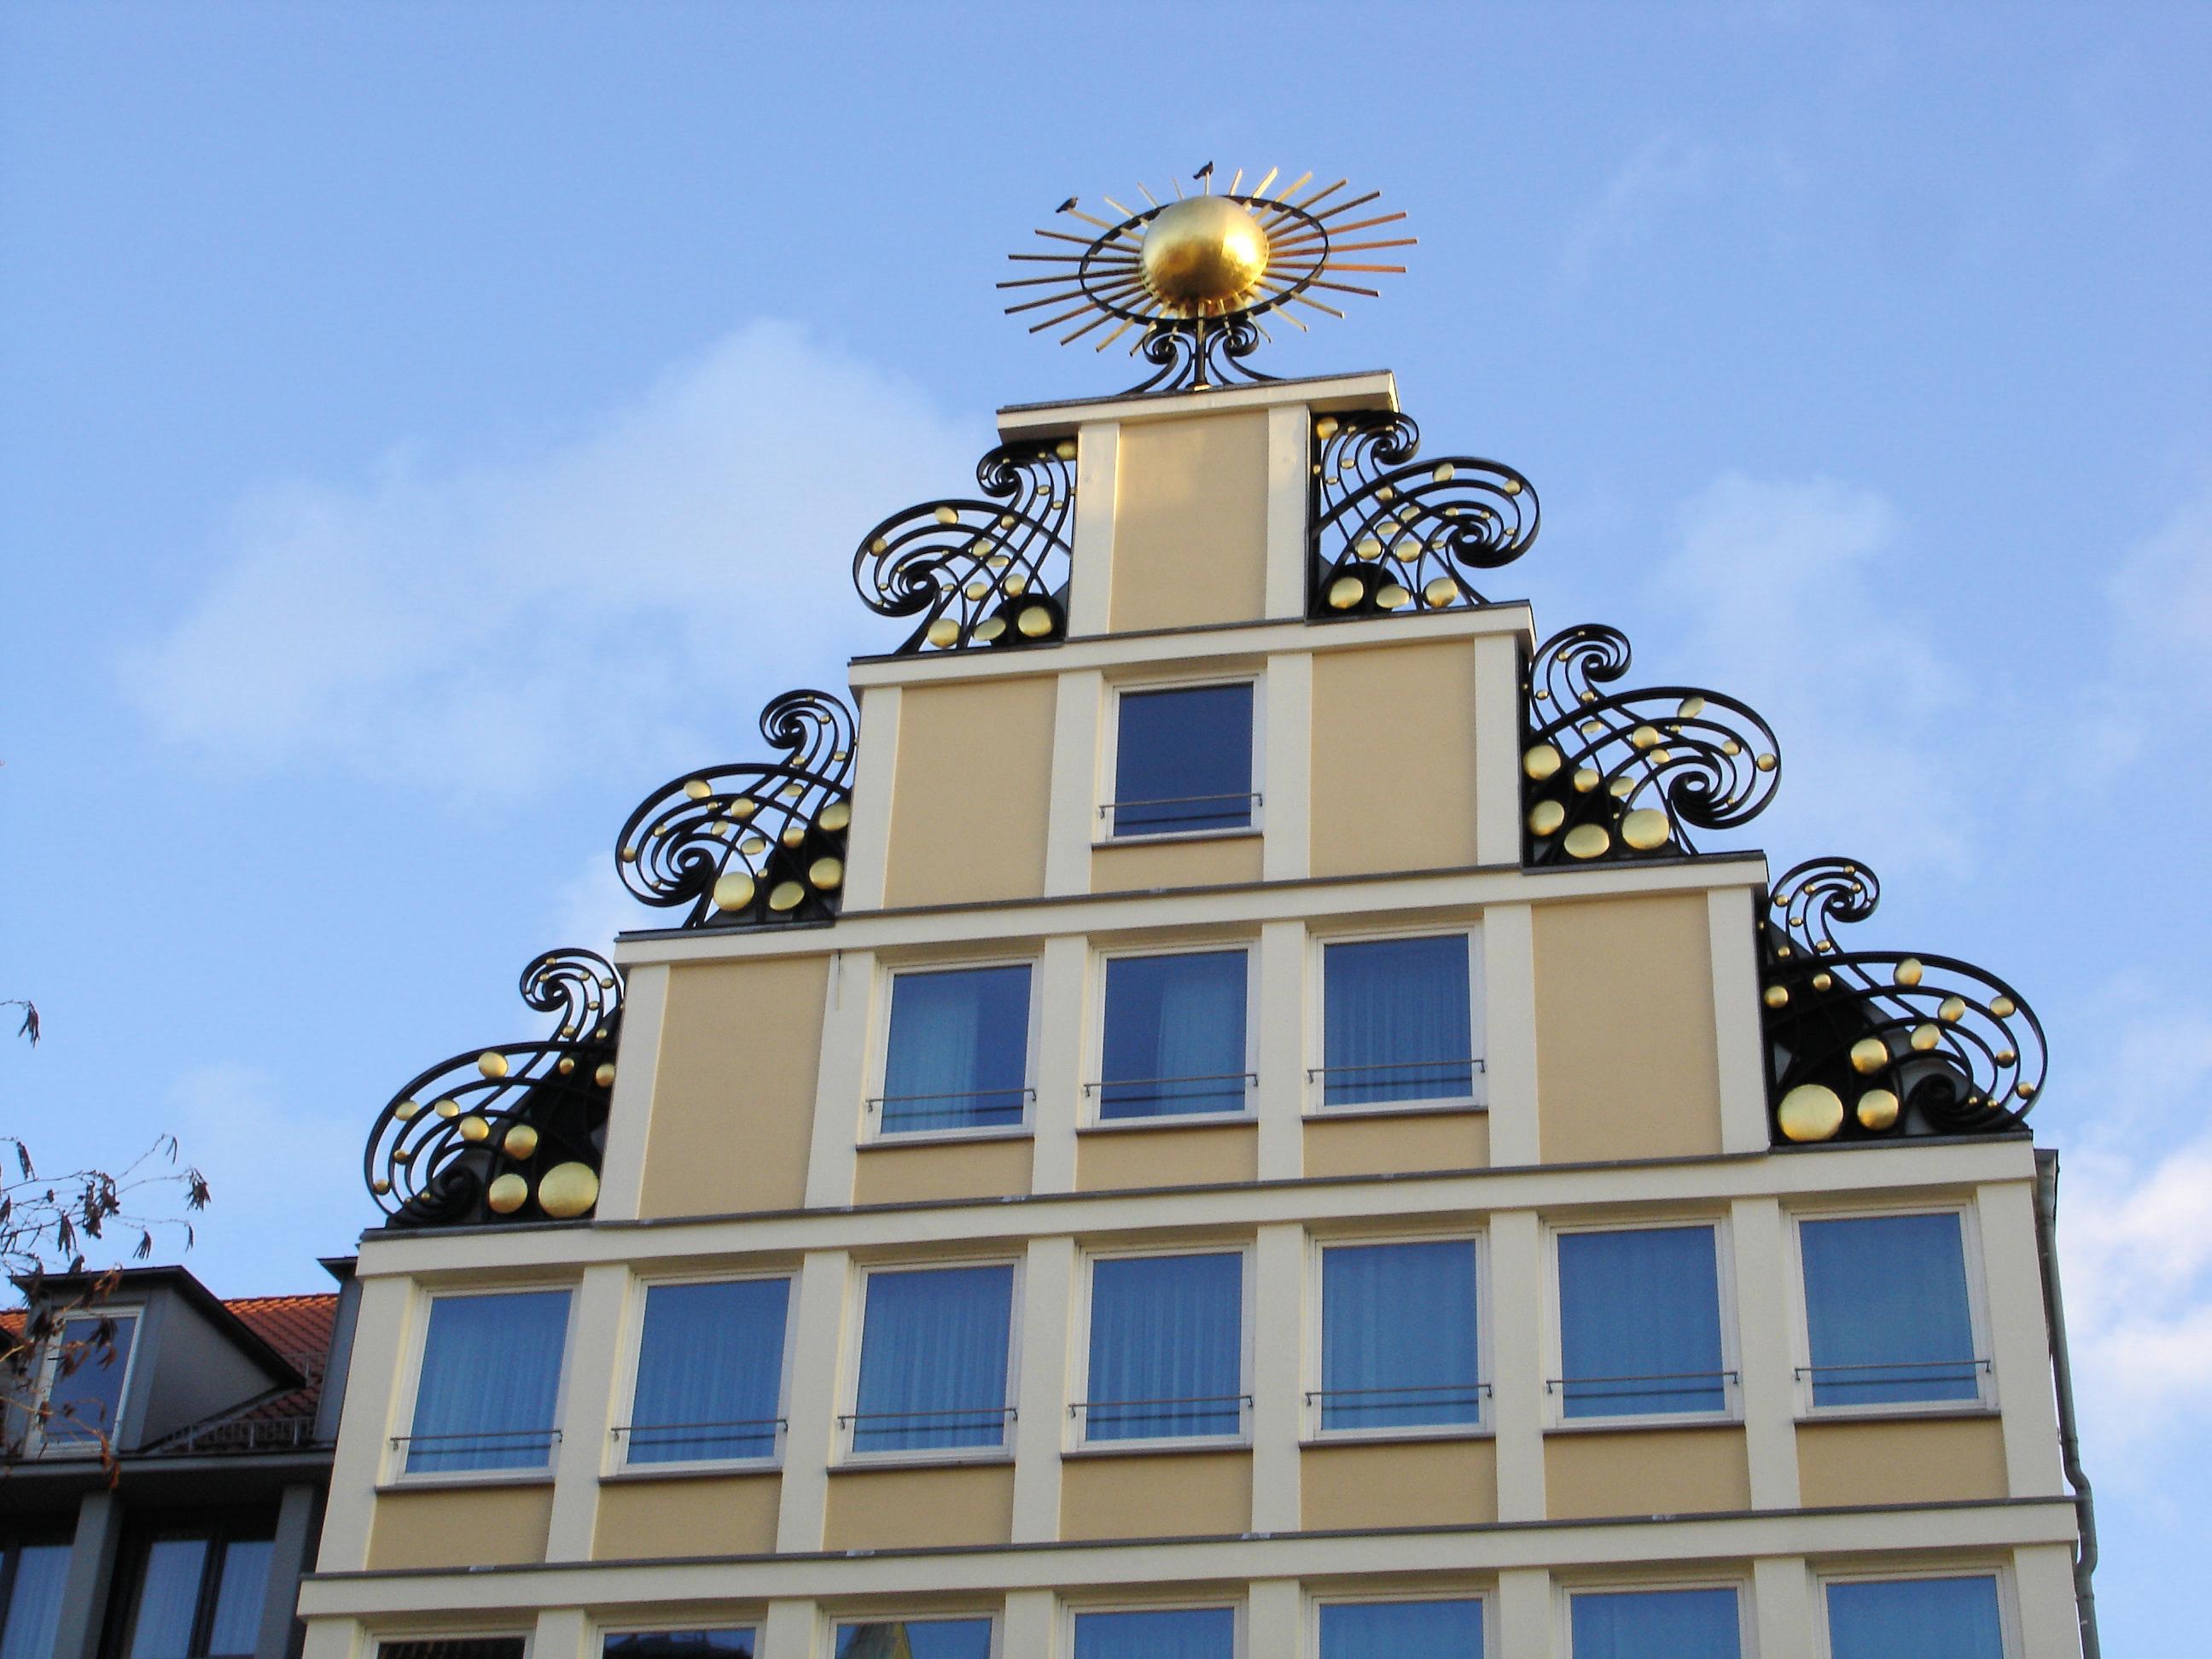 File Rostock Giebel Haus Sonne Wikimedia mons